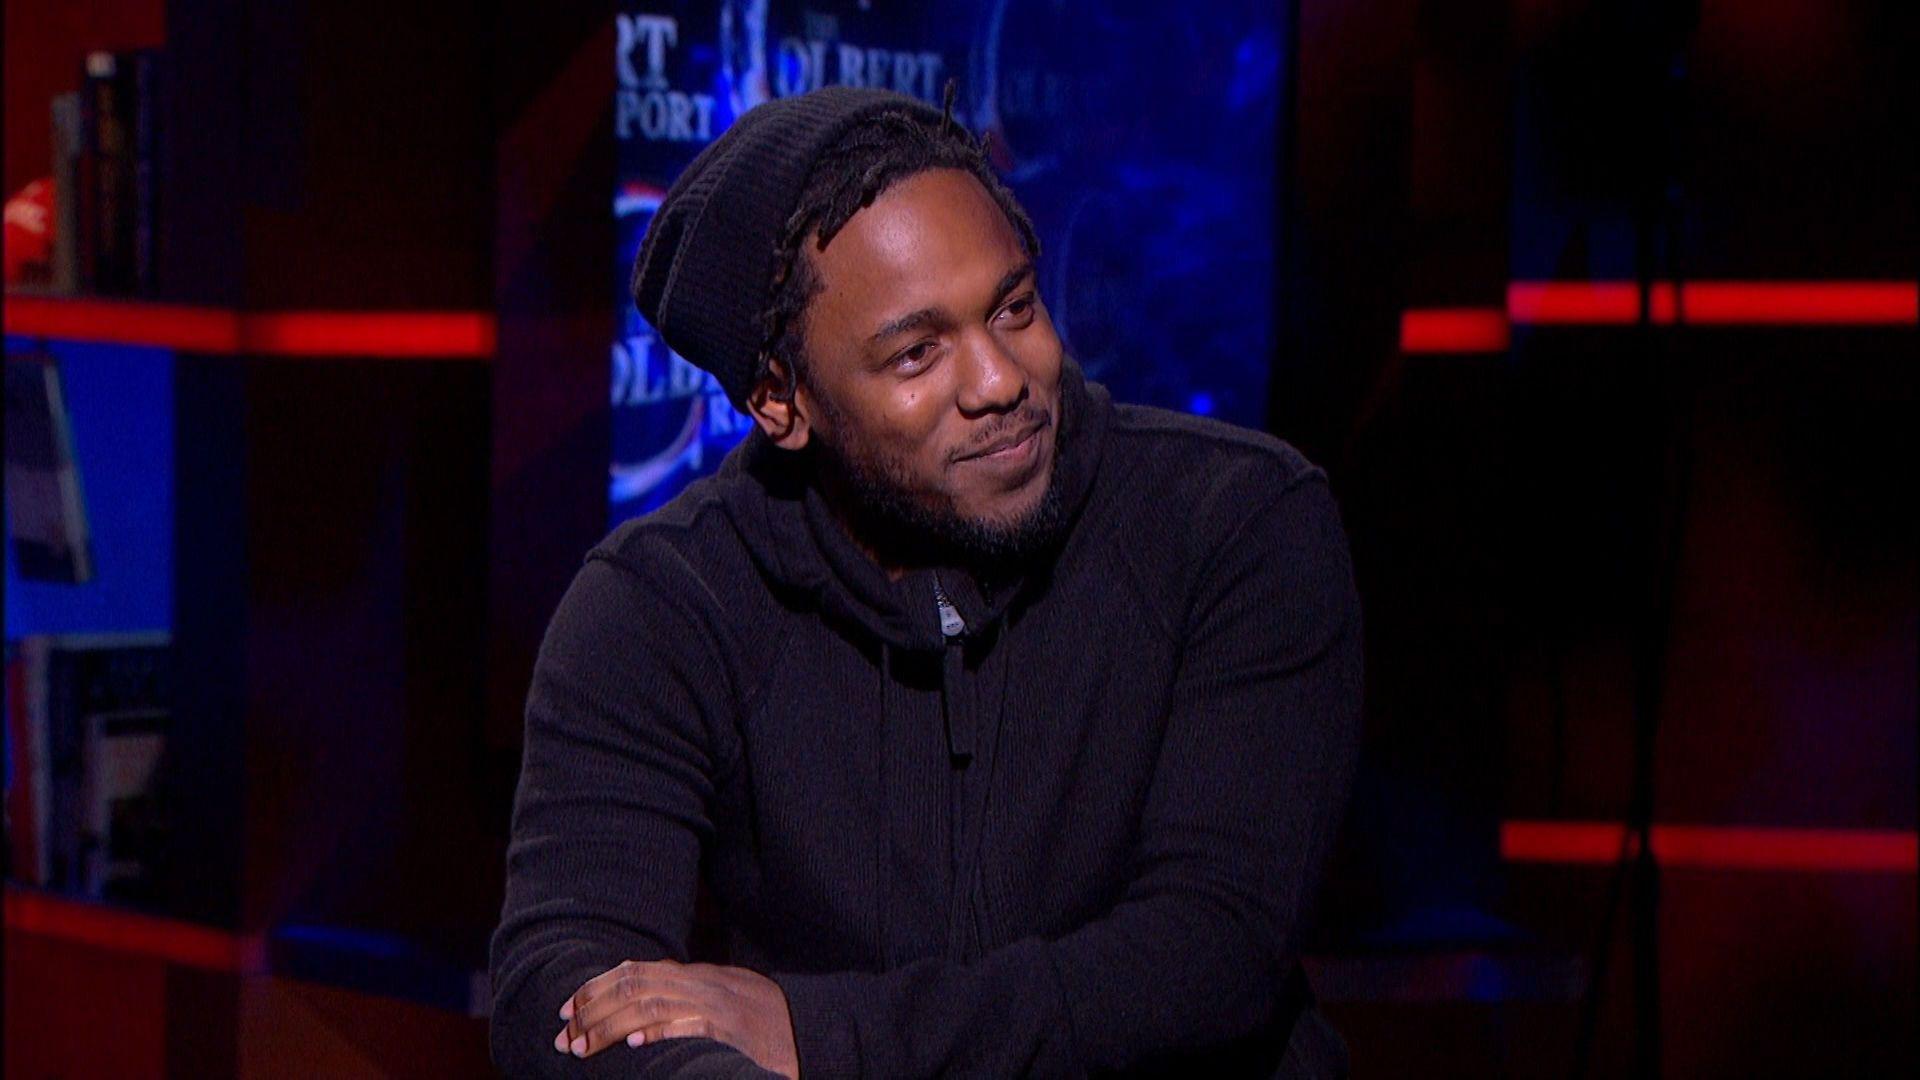 Kendrick Lamar On The Colbert Report Kendrick Lamar Rapper